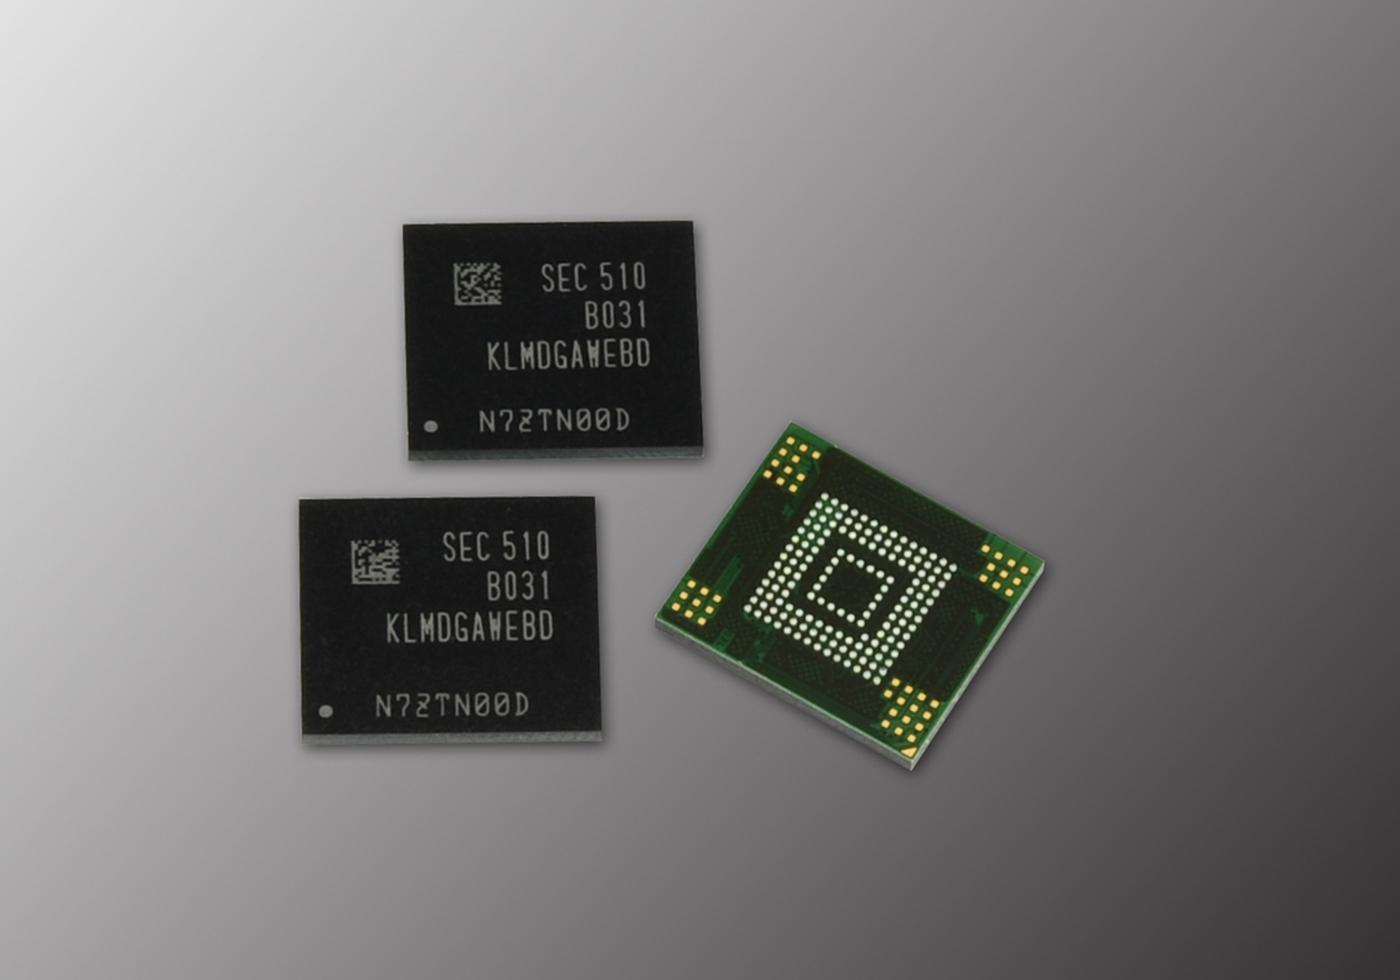 Samsung 128GB 3-bit eMMC 5.0 Mobile Storage for Mid-Market (Photo: Business Wire)